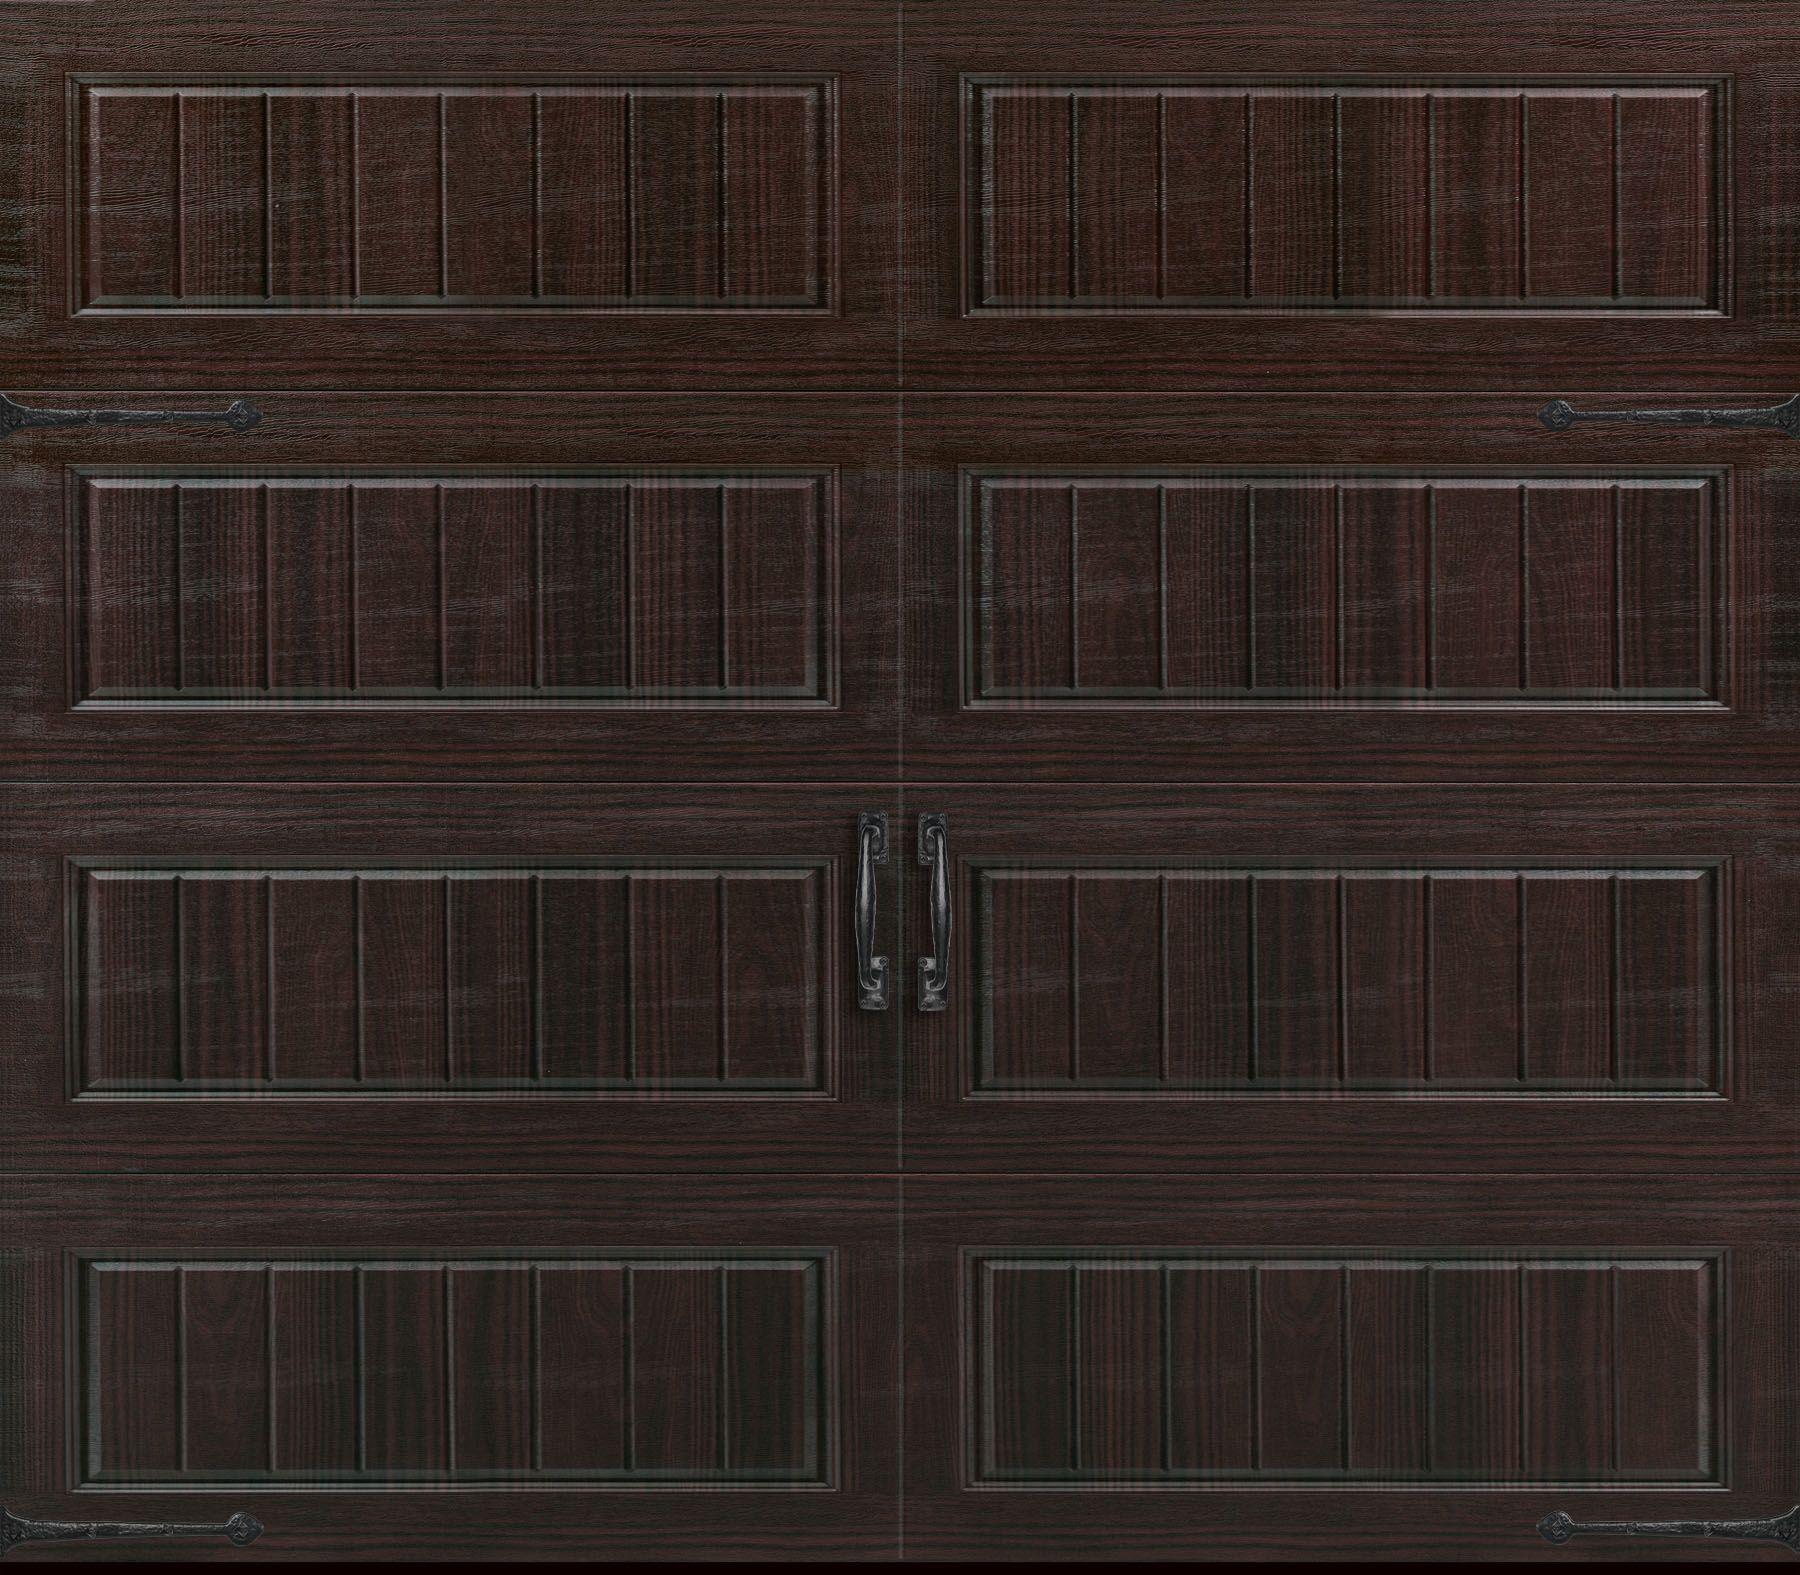 1575 #2F2621  Www.amarr.com Exterior Pinterest Garage Doors Doors And Garage save image Amarr Commercial Doors 36671800